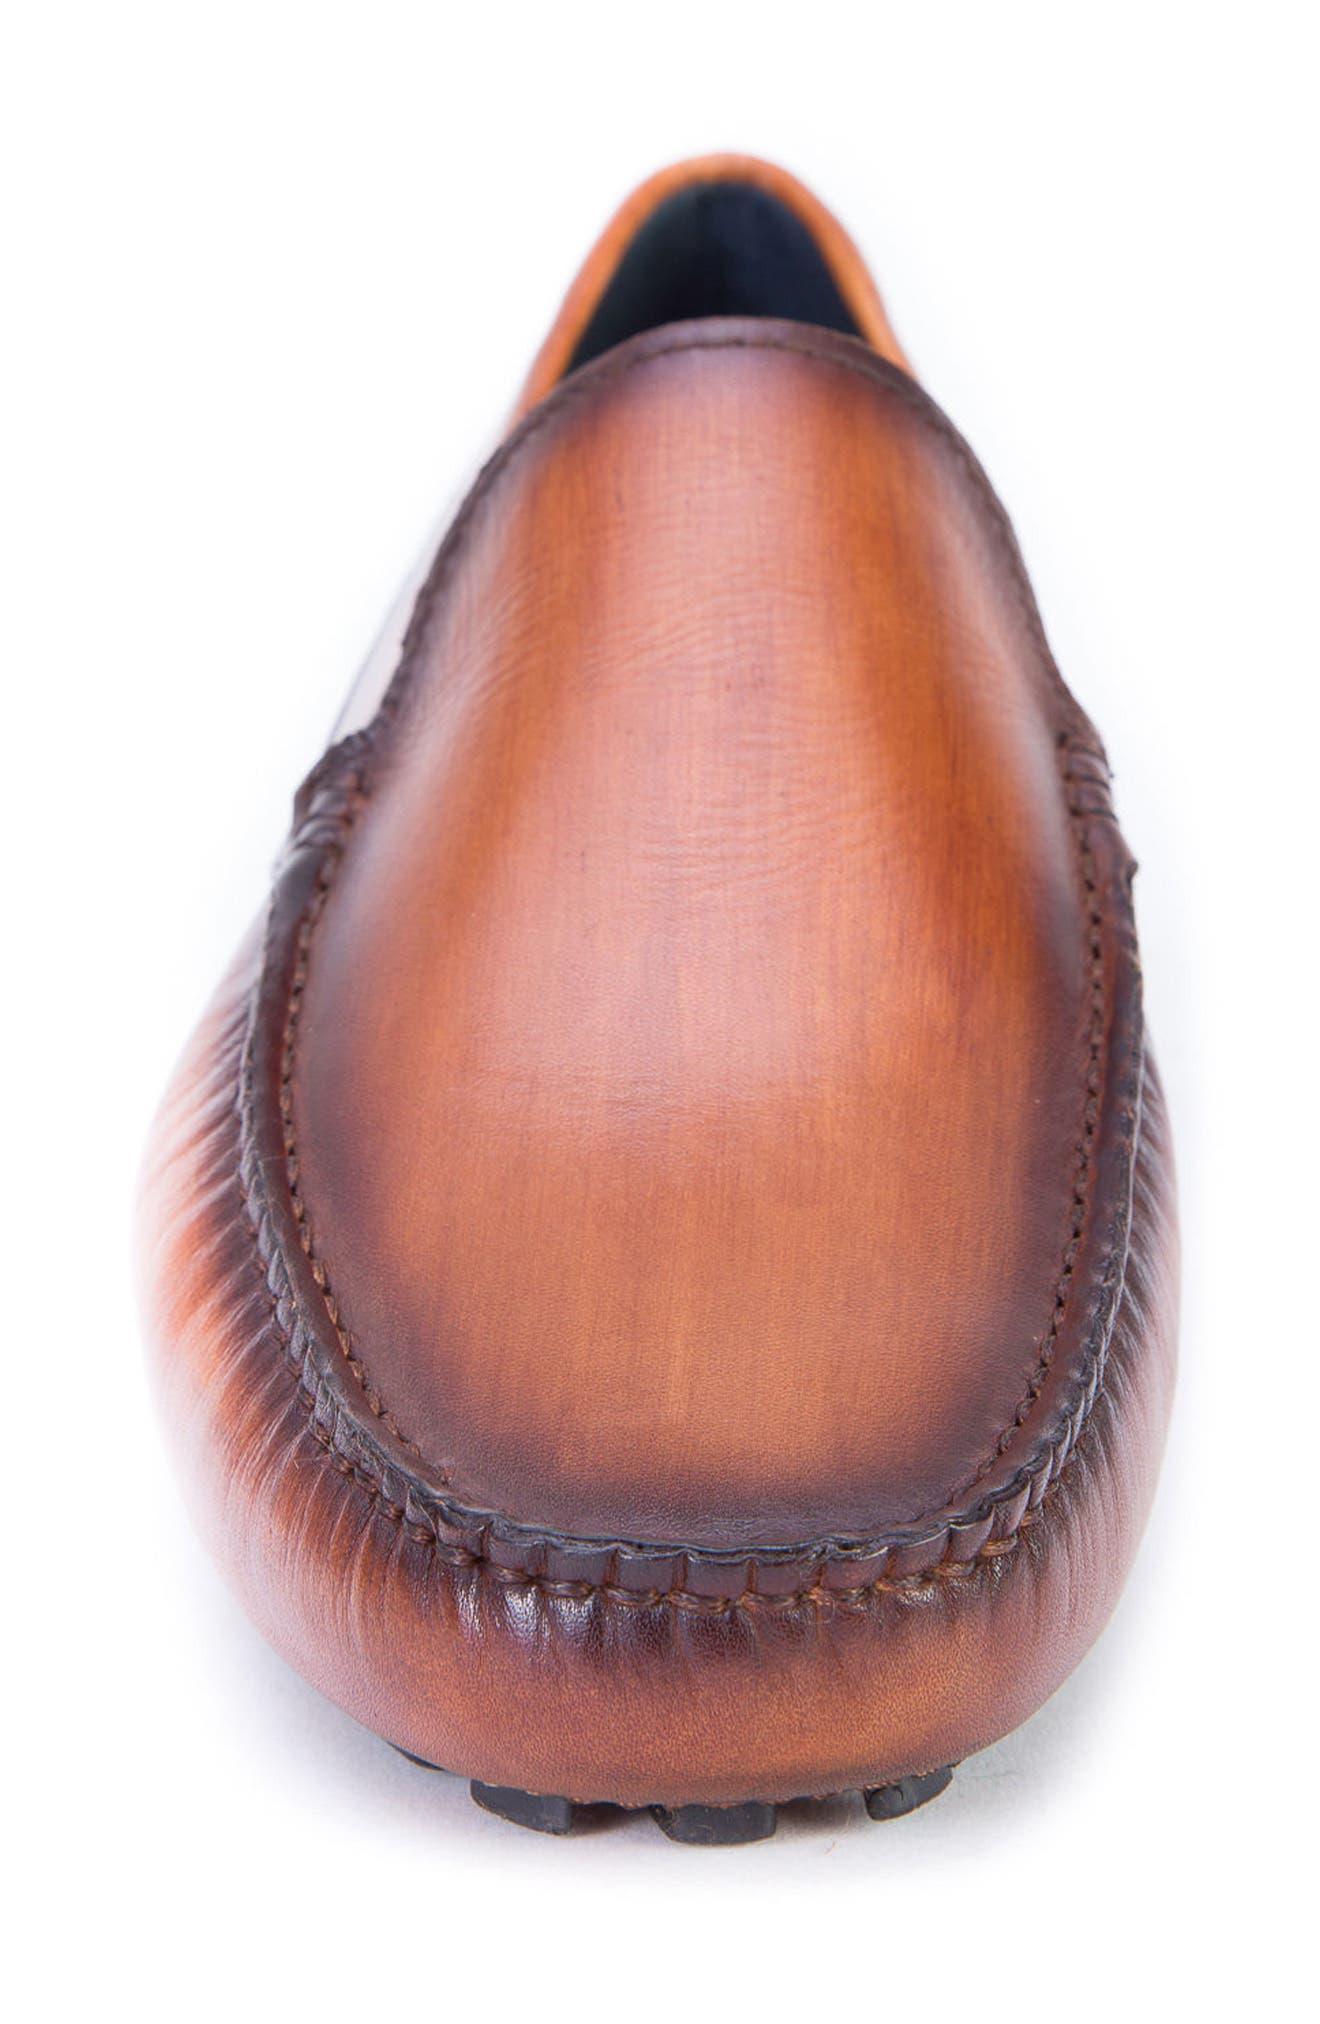 Matisse Driving Moccasin,                             Alternate thumbnail 4, color,                             Cognac Leather